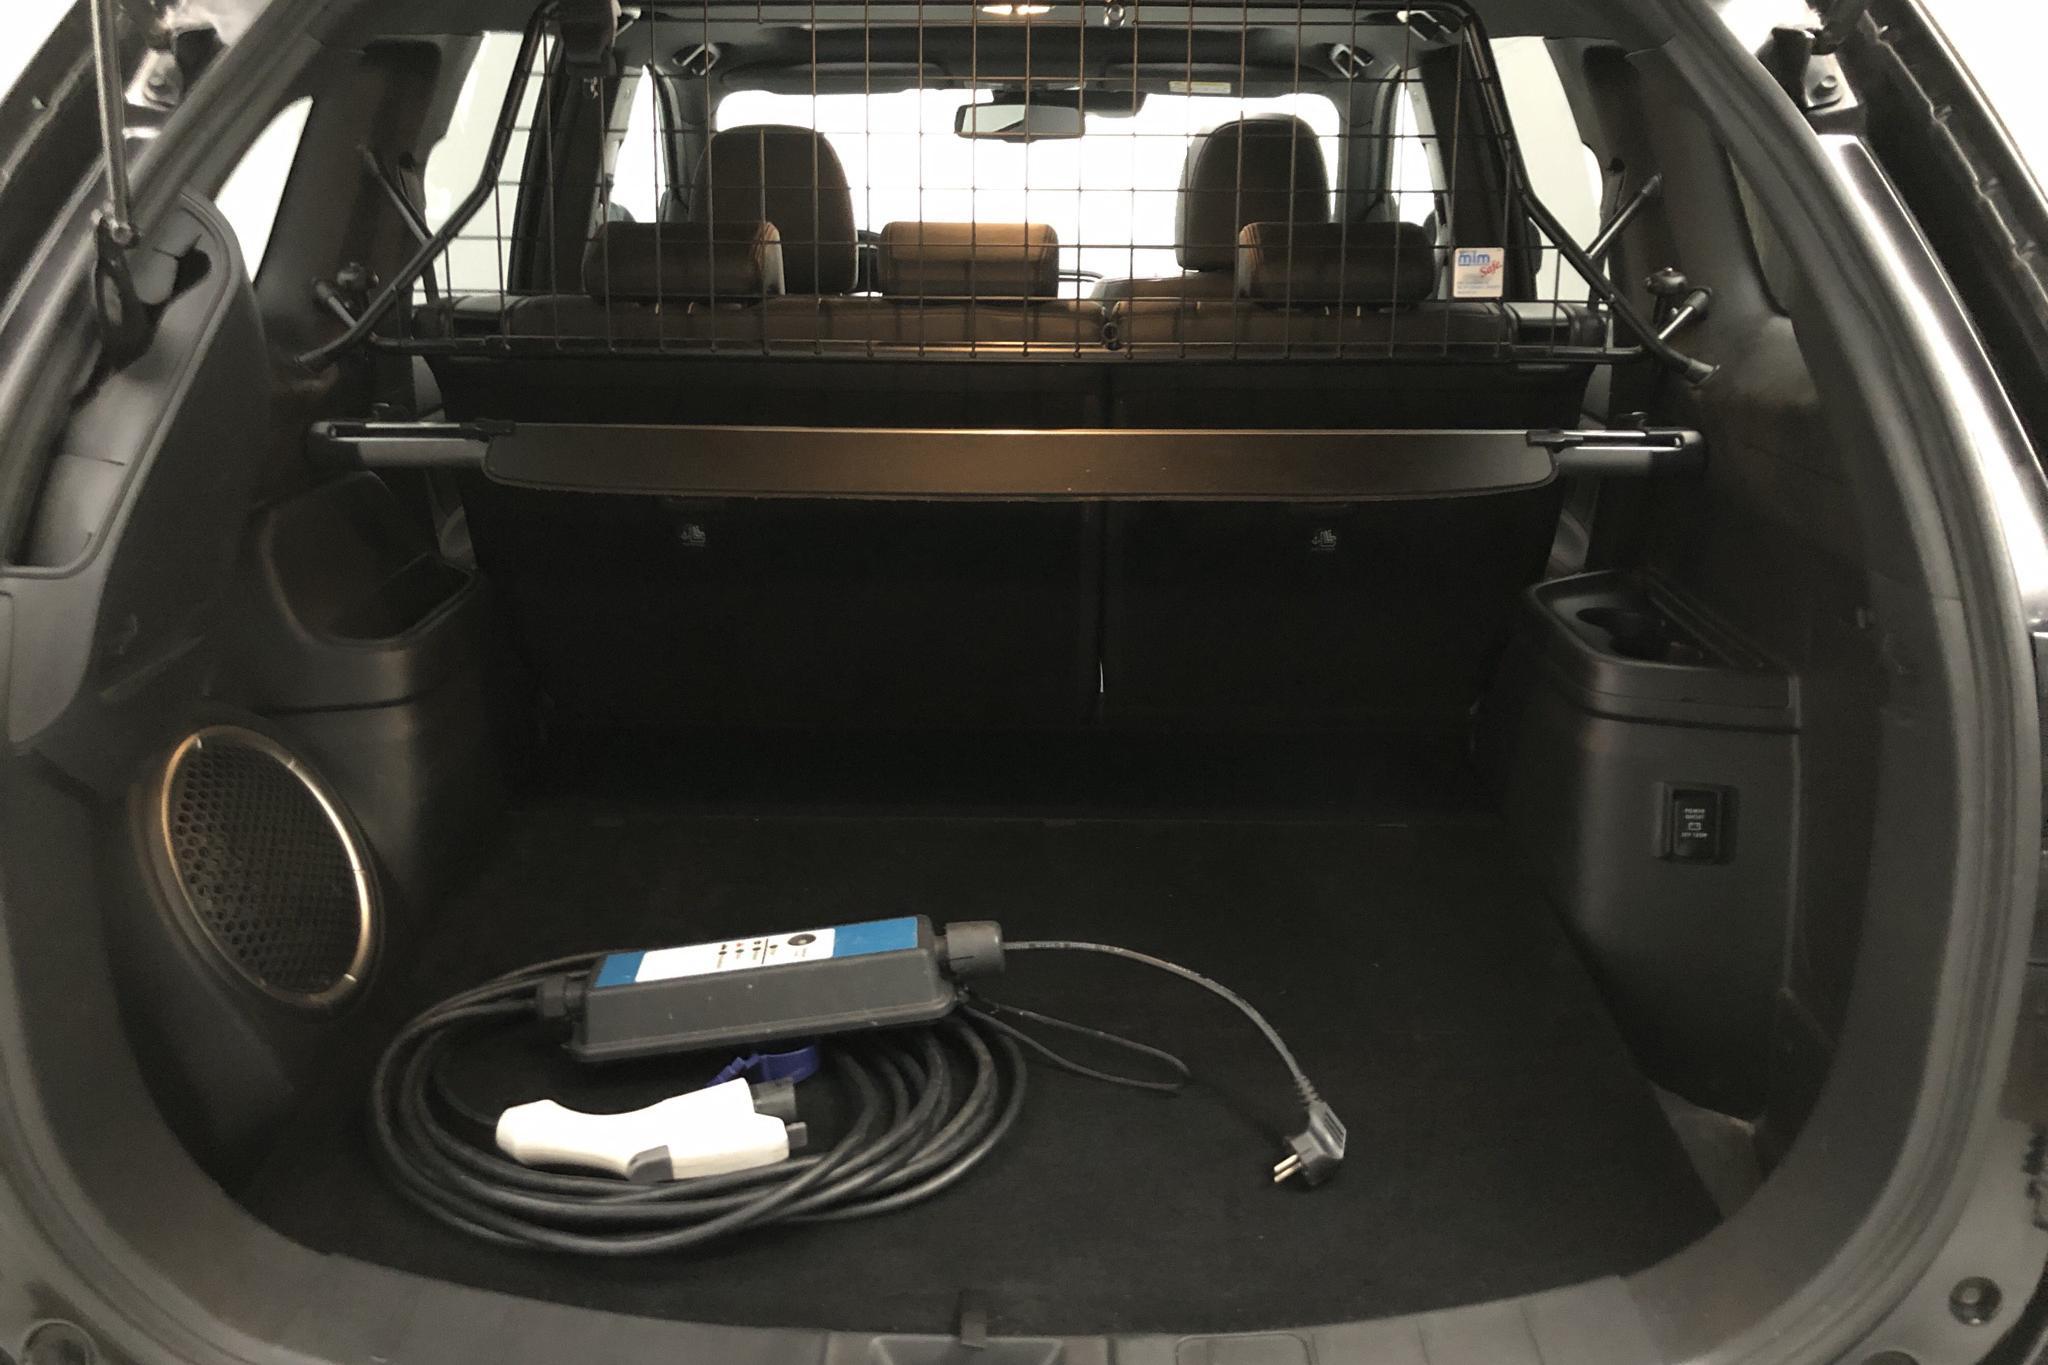 Mitsubishi Outlander 2.0 Plug-in Hybrid 4WD (121hk) - 12 790 mil - Automat - svart - 2018